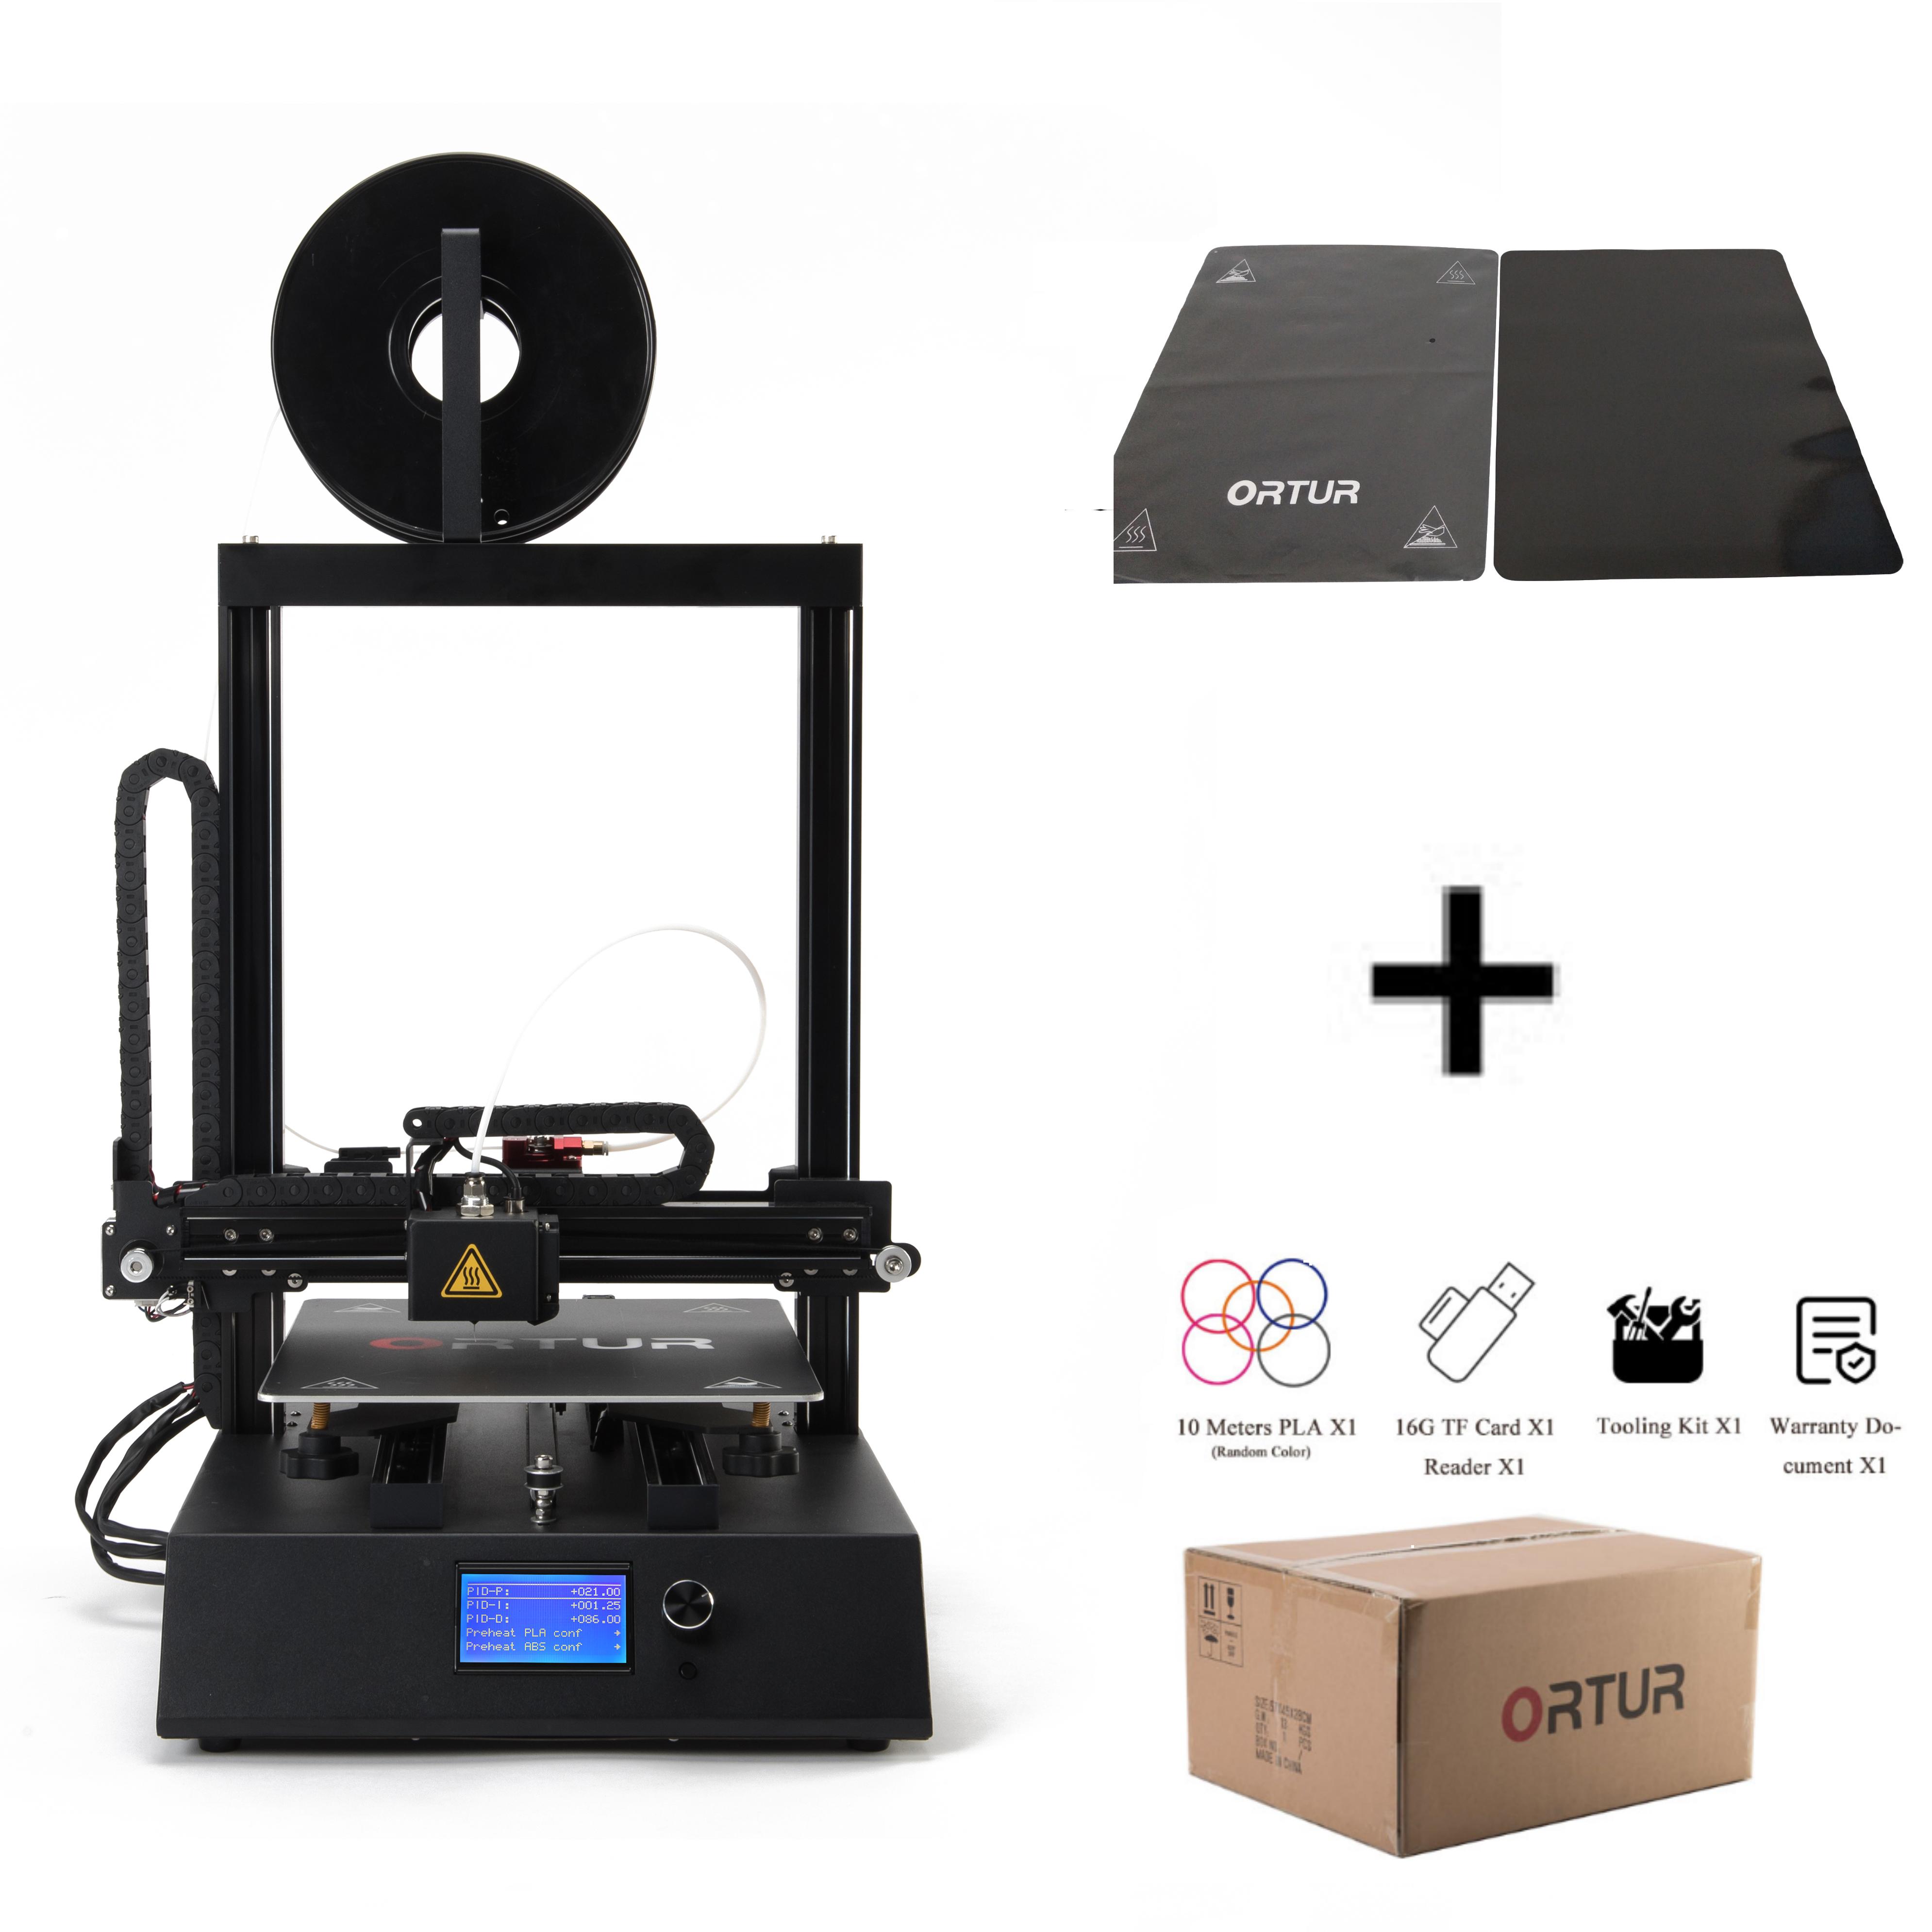 Nema 17 Stepper Motor 2 Phase CNC Robot Reprap Makerbot Prusa imprimante 3d